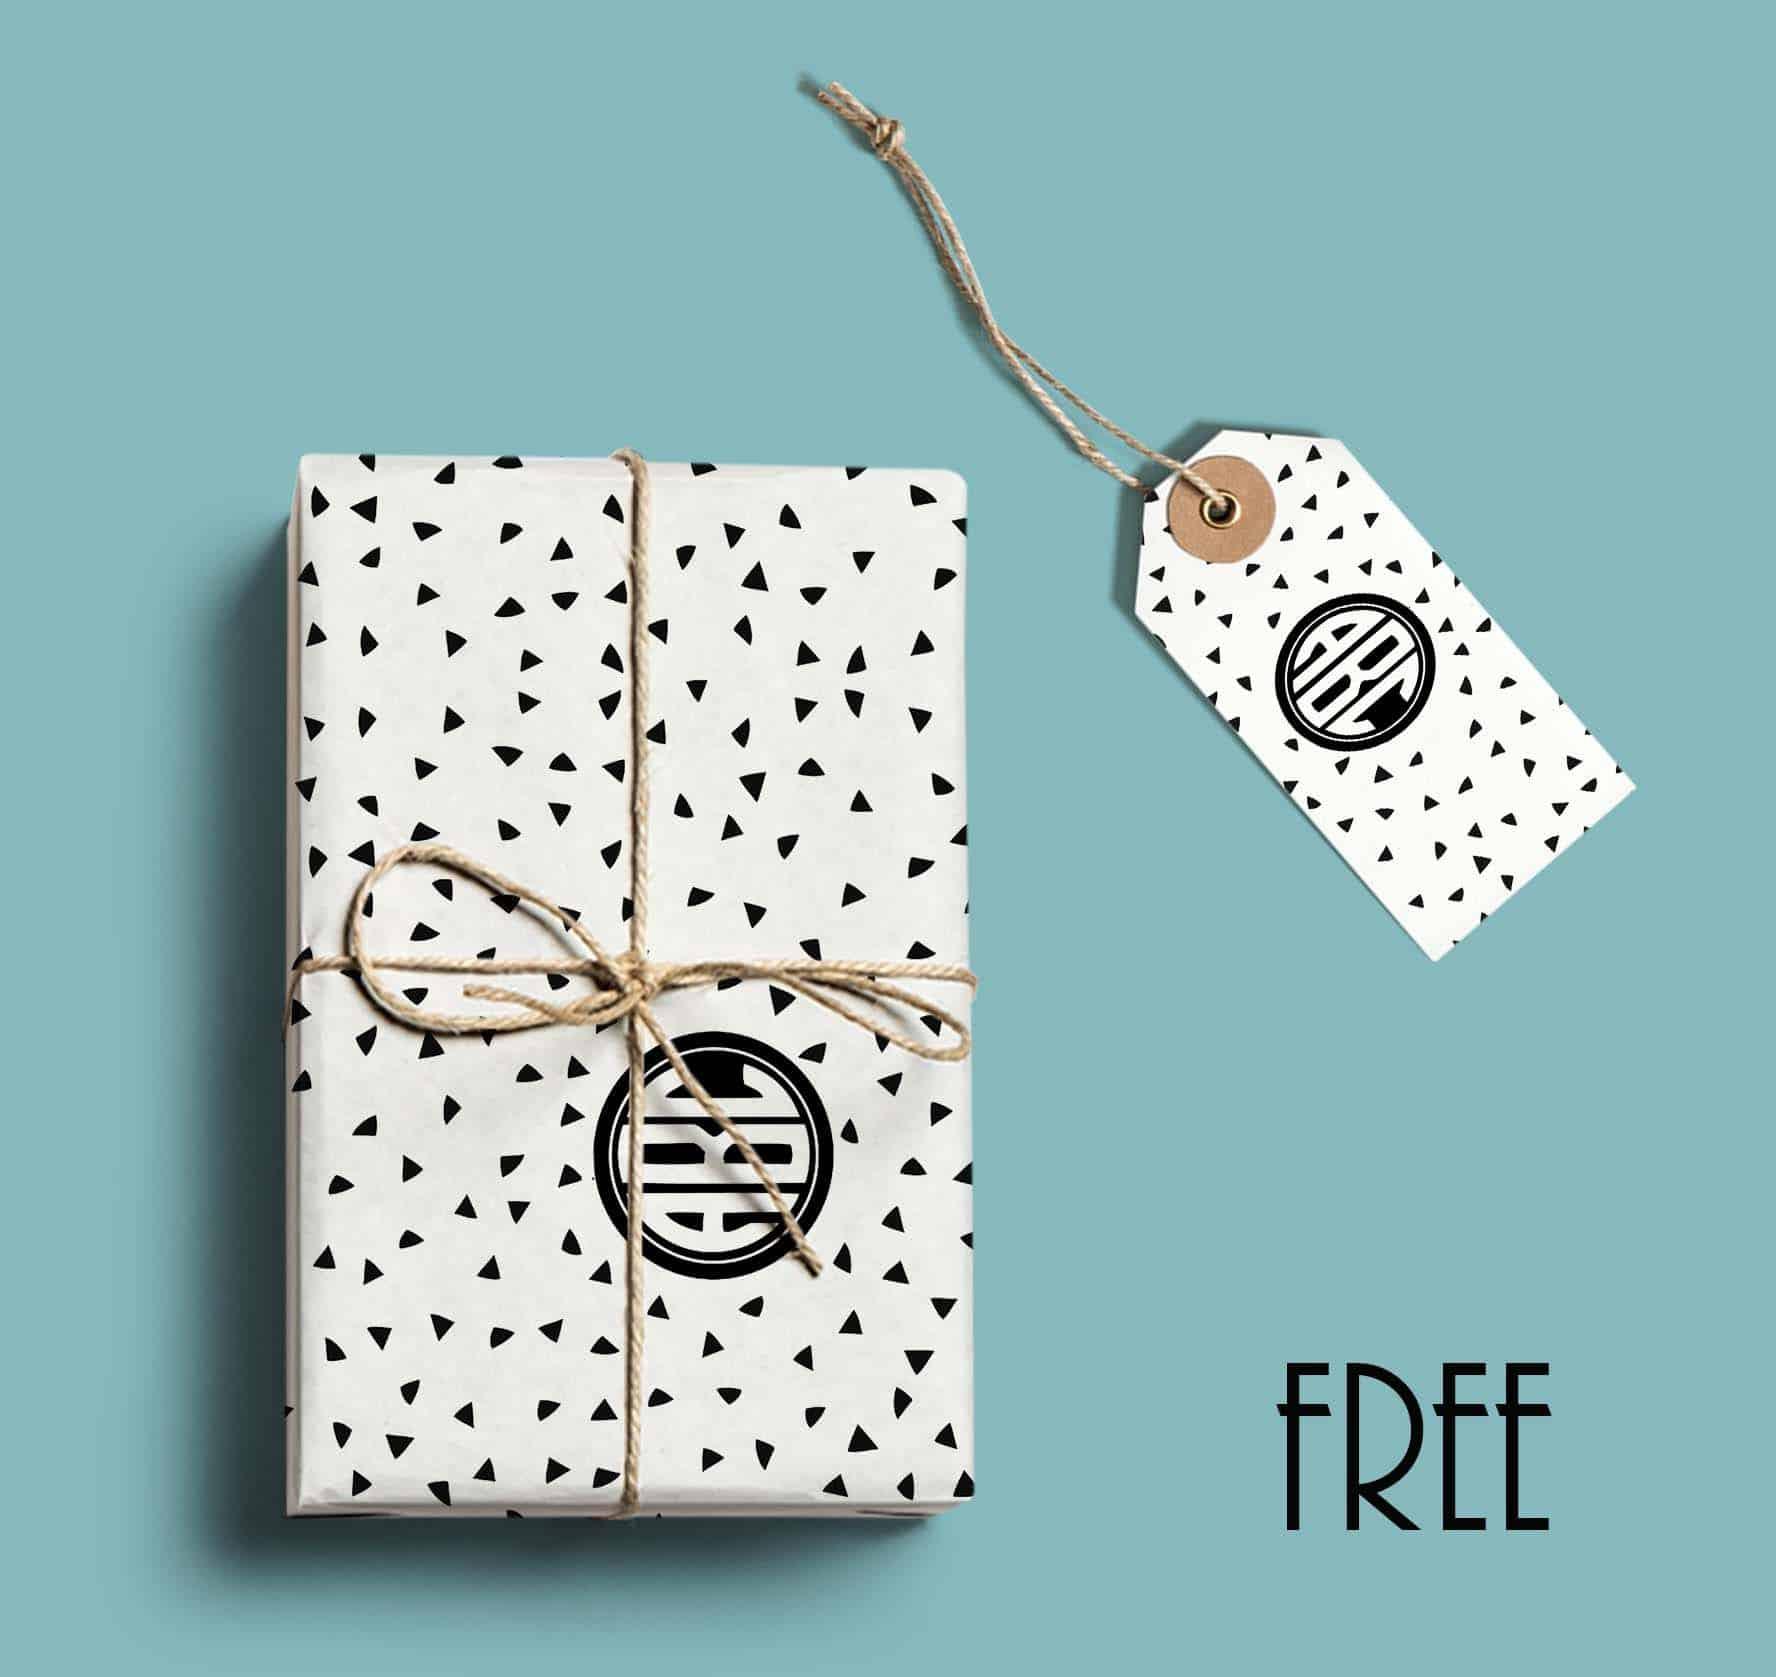 Free Printable Monogram Paper - Free Printable Monogram